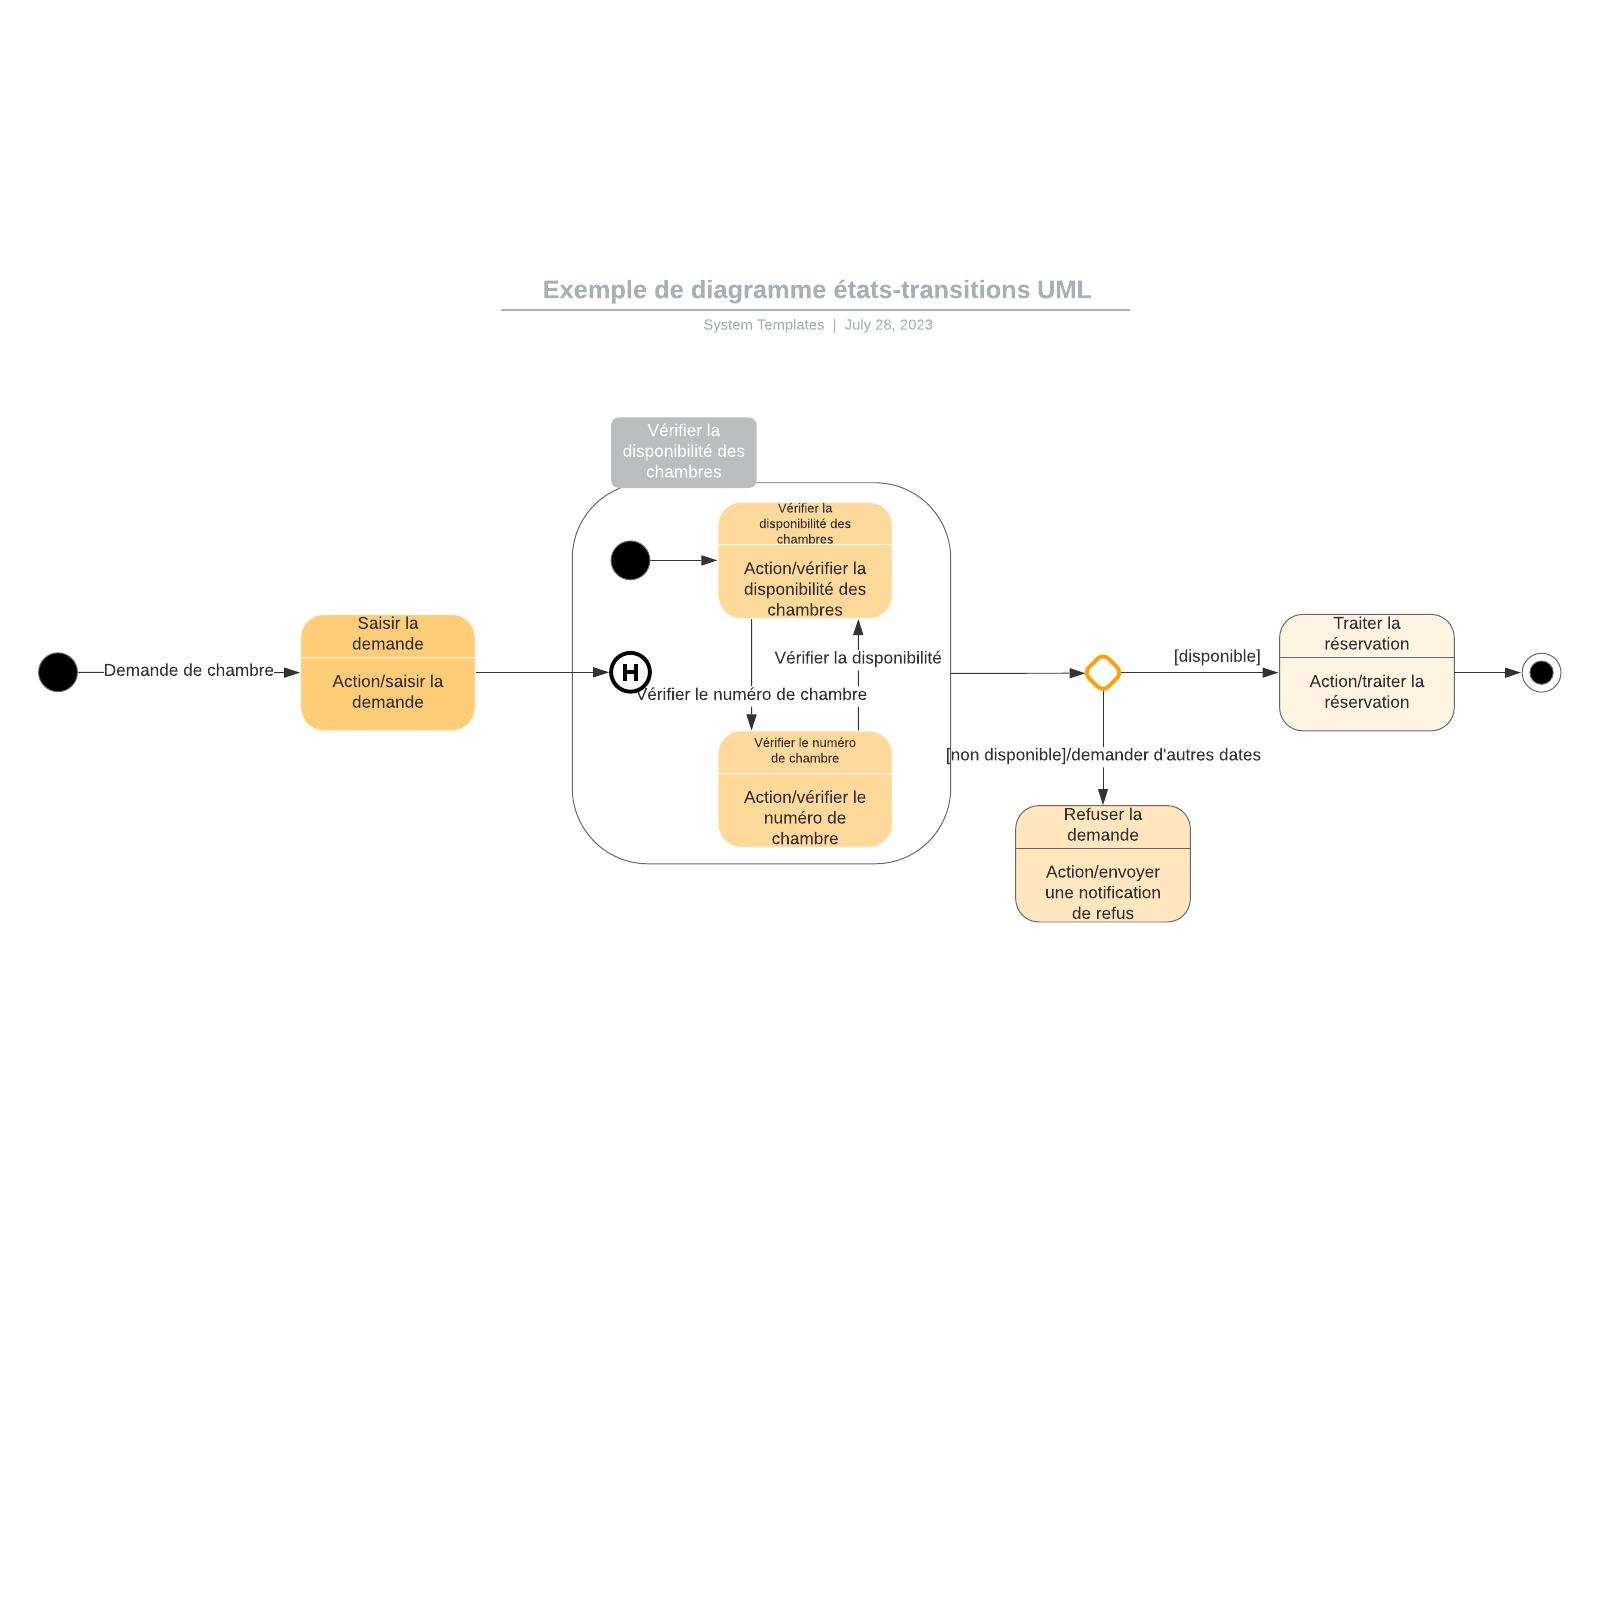 exemple de diagramme états-transitions UML